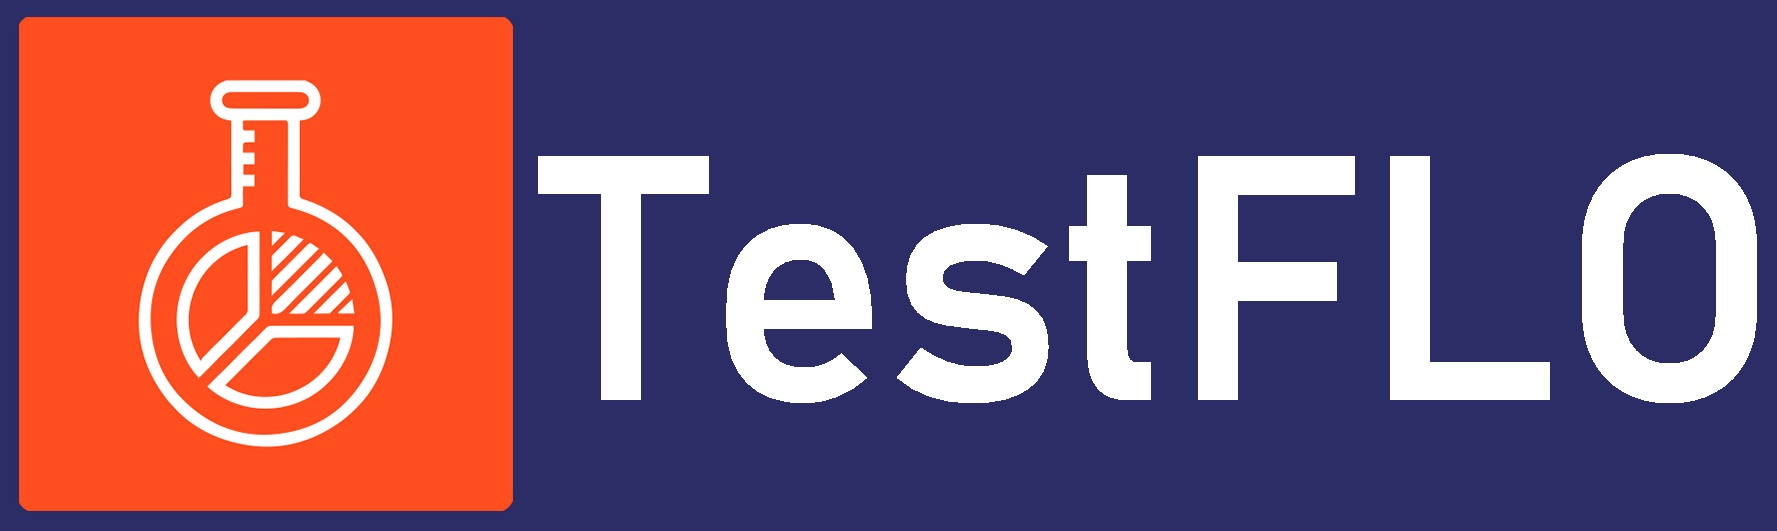 Test Management Tools of 2019 | SoftwareTestingMaterial